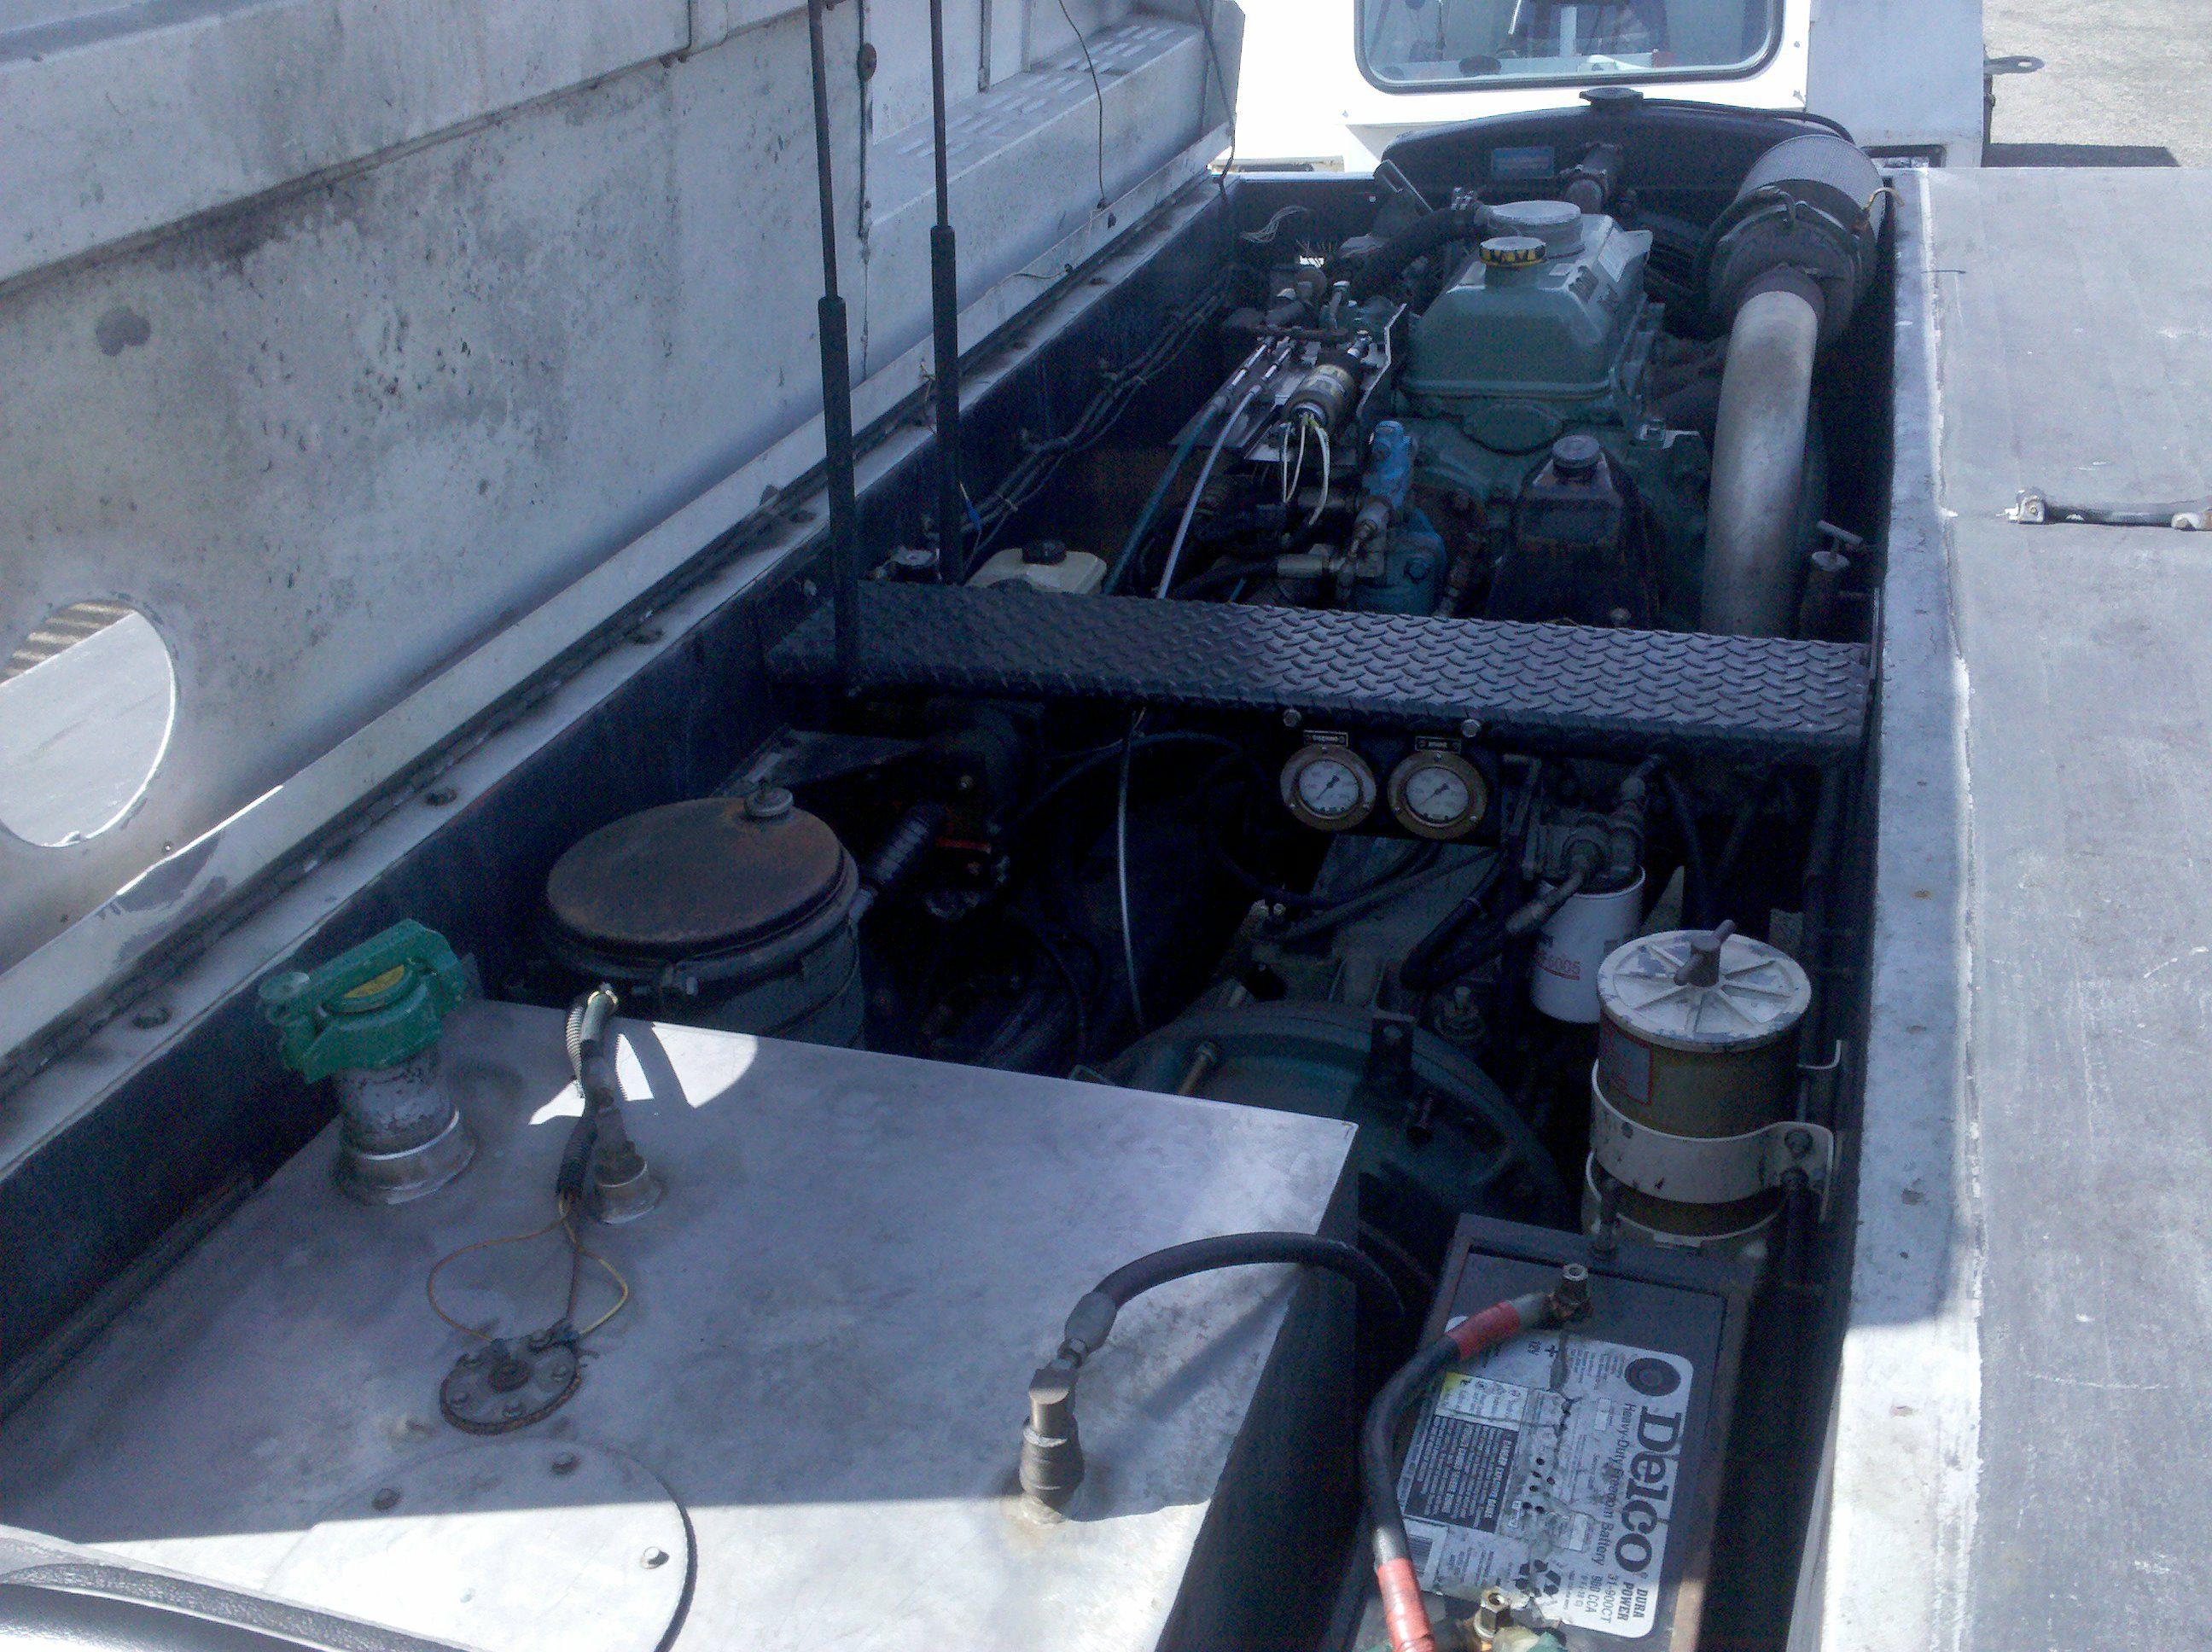 Stewart & Stevenson Pushback Tractor | Planet GSE